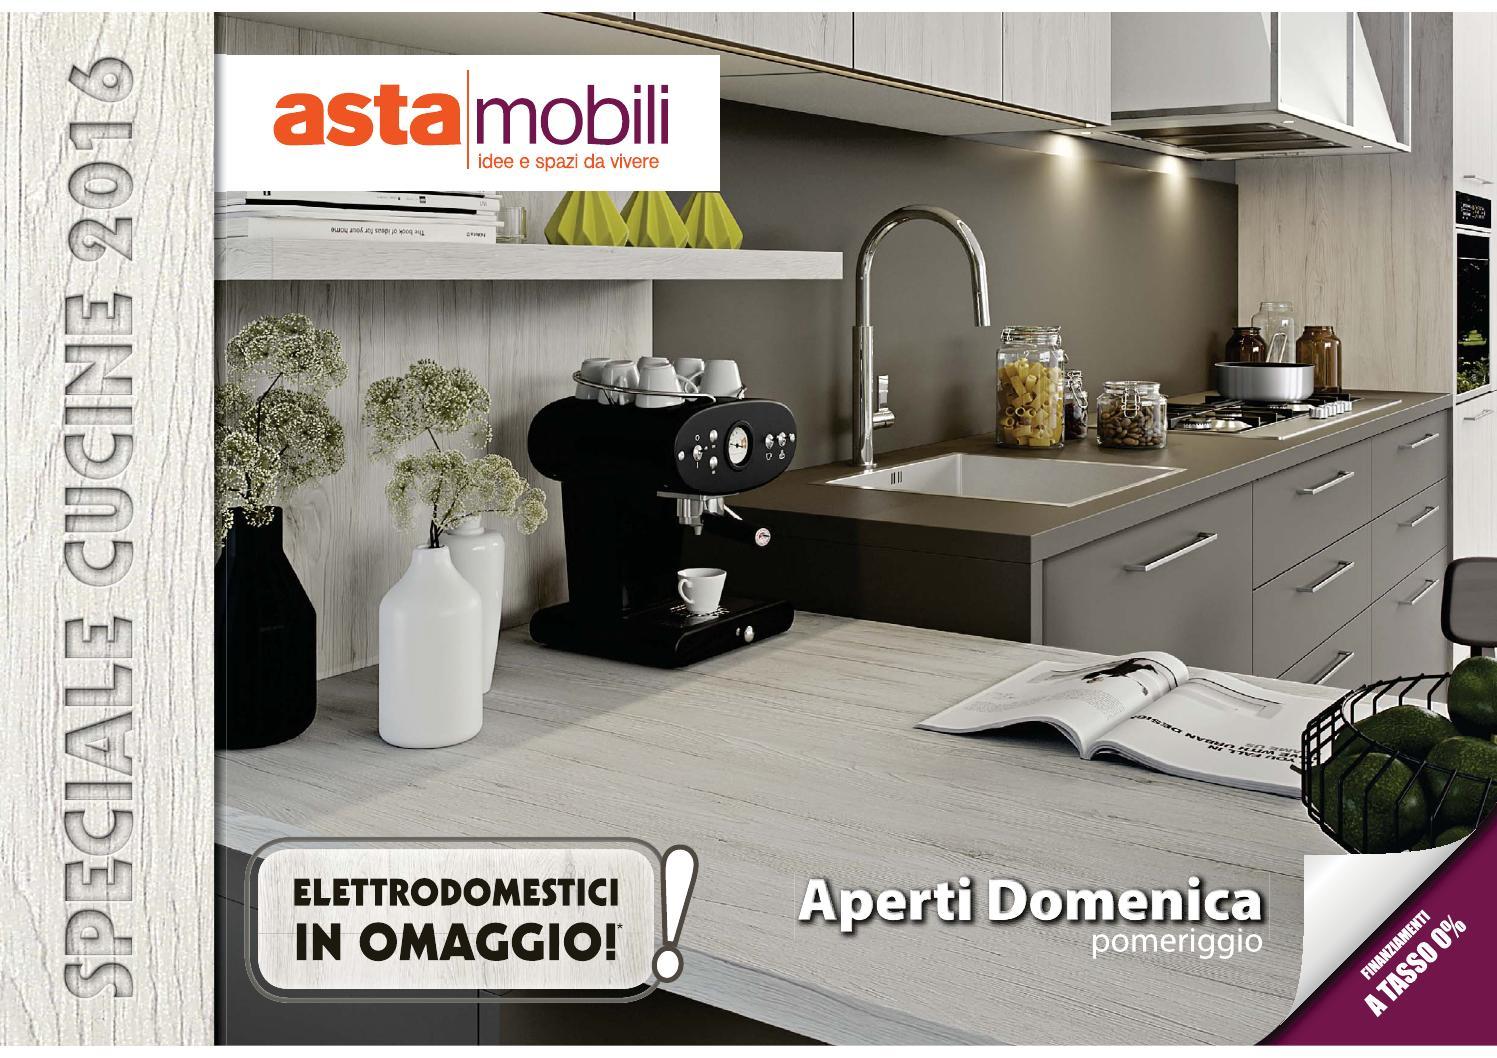 Speciale cucine 2016 by asta mobili sicilia issuu - Asta mobili cucine economiche ...